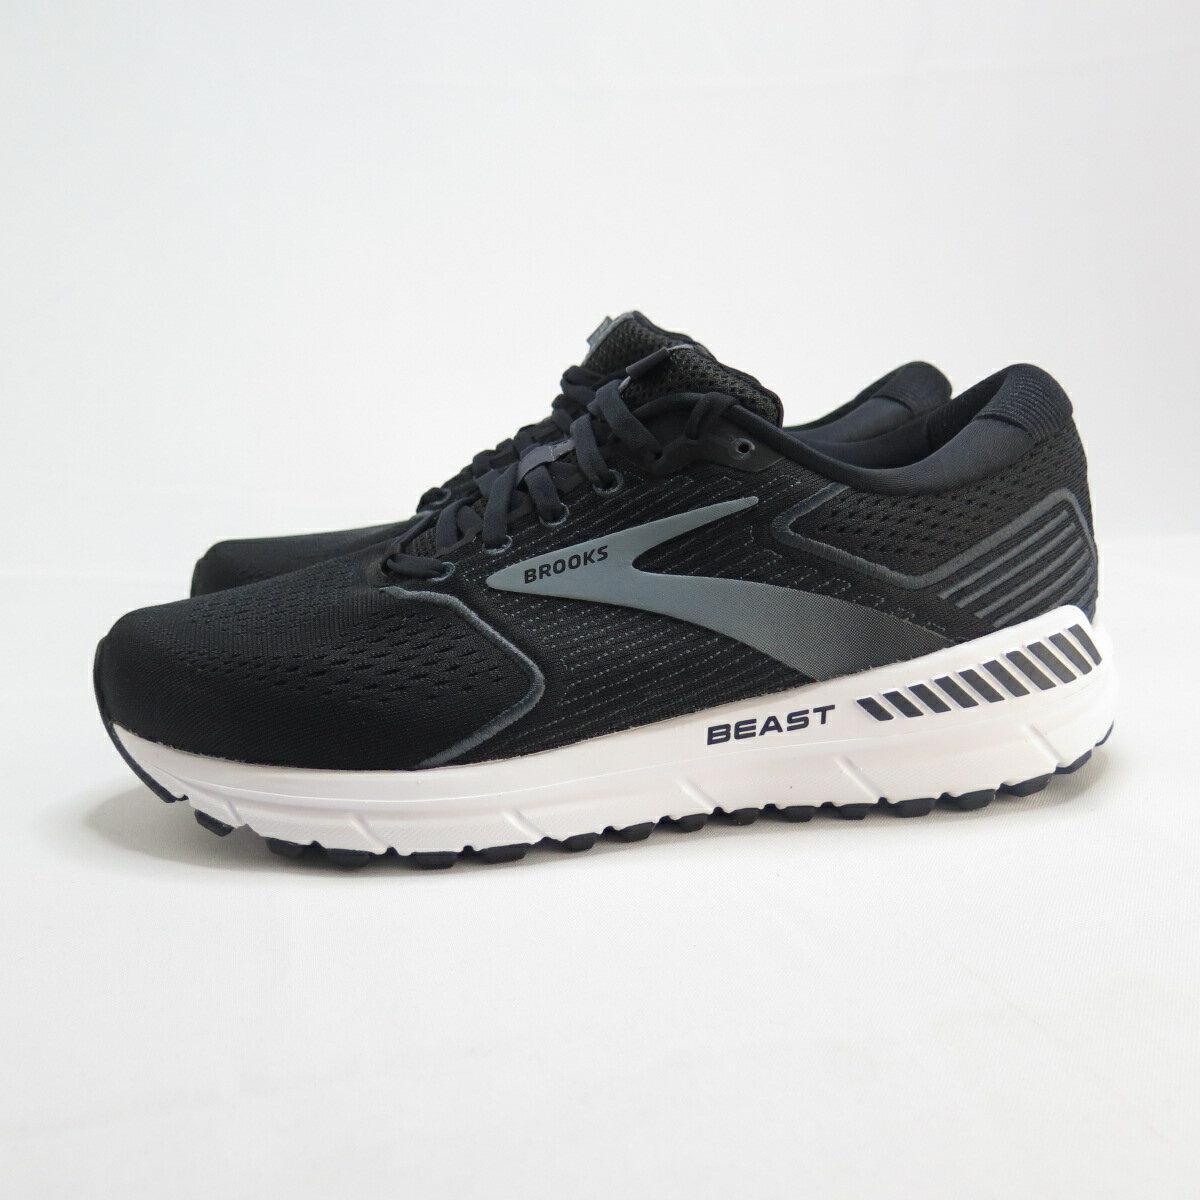 Brooks BEAST 20 男款 高支撐 慢跑鞋 4E楦 1103274E051 黑【iSport愛運動】